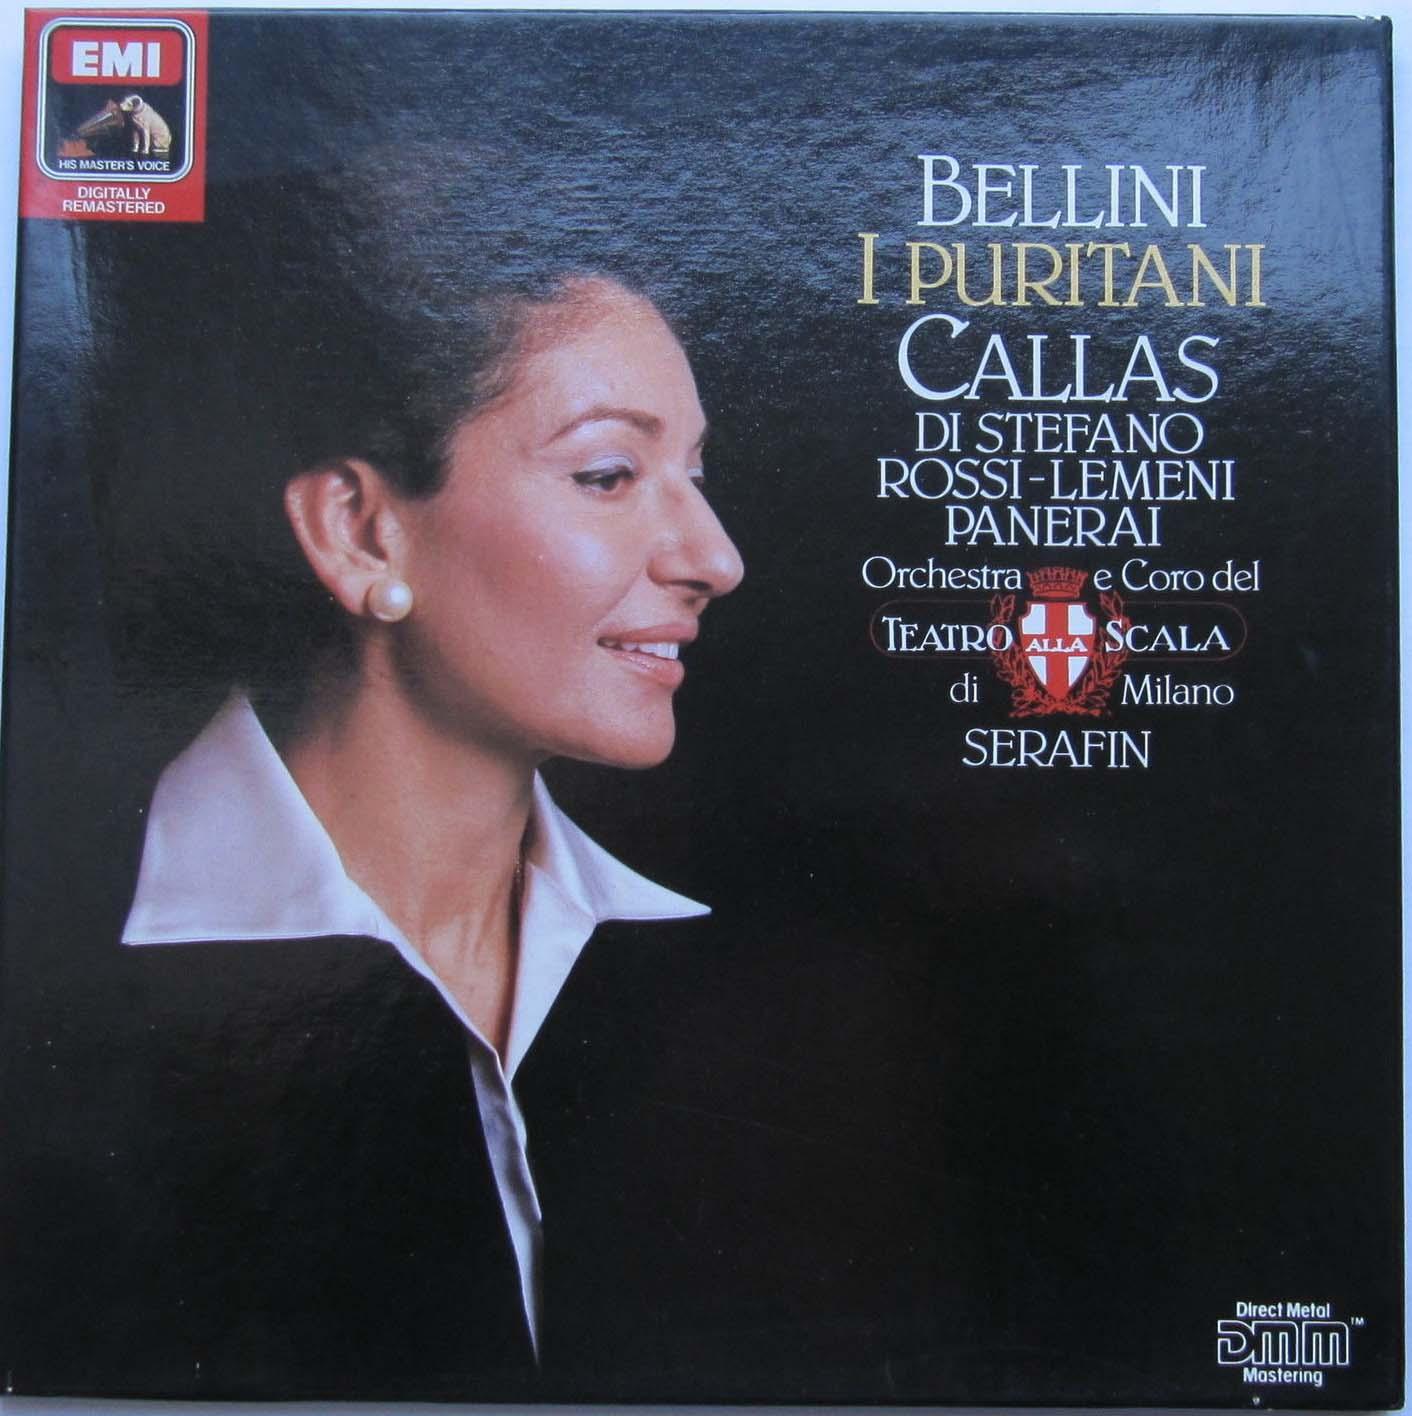 Bellini -Callas / Di Stefano / Rossi-Lemeni -  Puritani